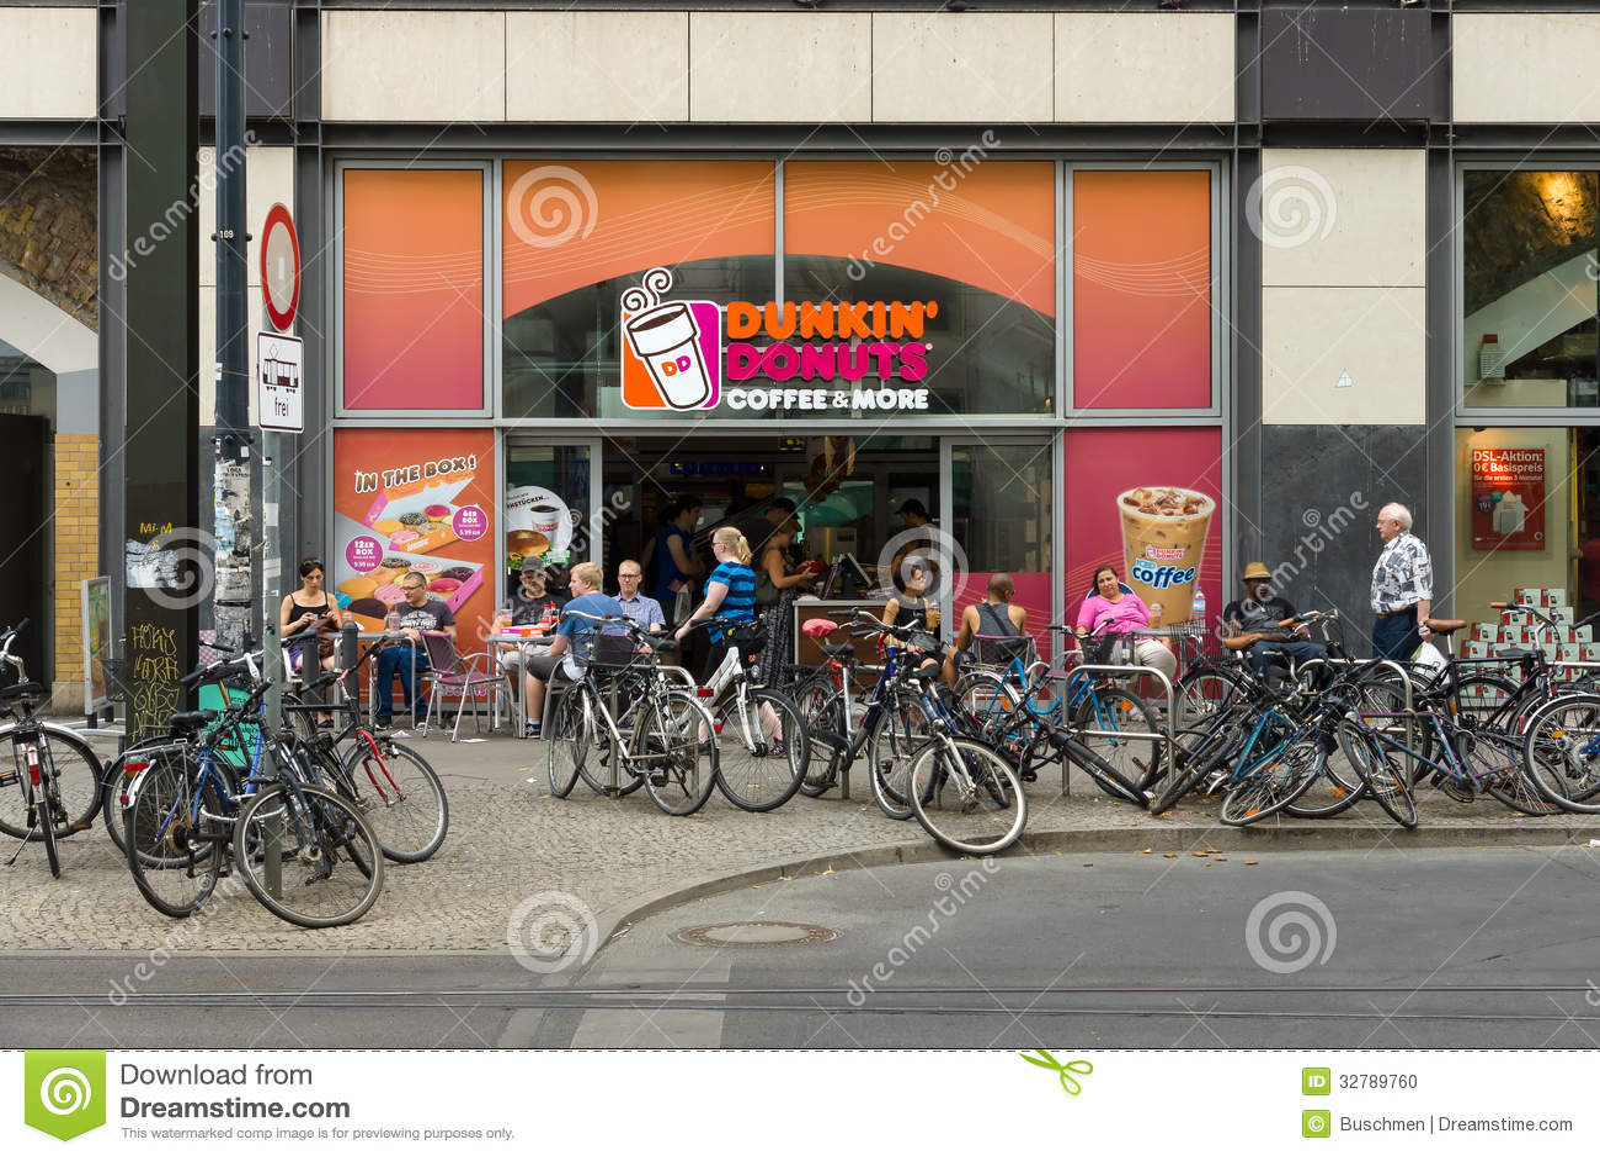 cafe dunkin donuts on alexanderplatz editorial image. Black Bedroom Furniture Sets. Home Design Ideas